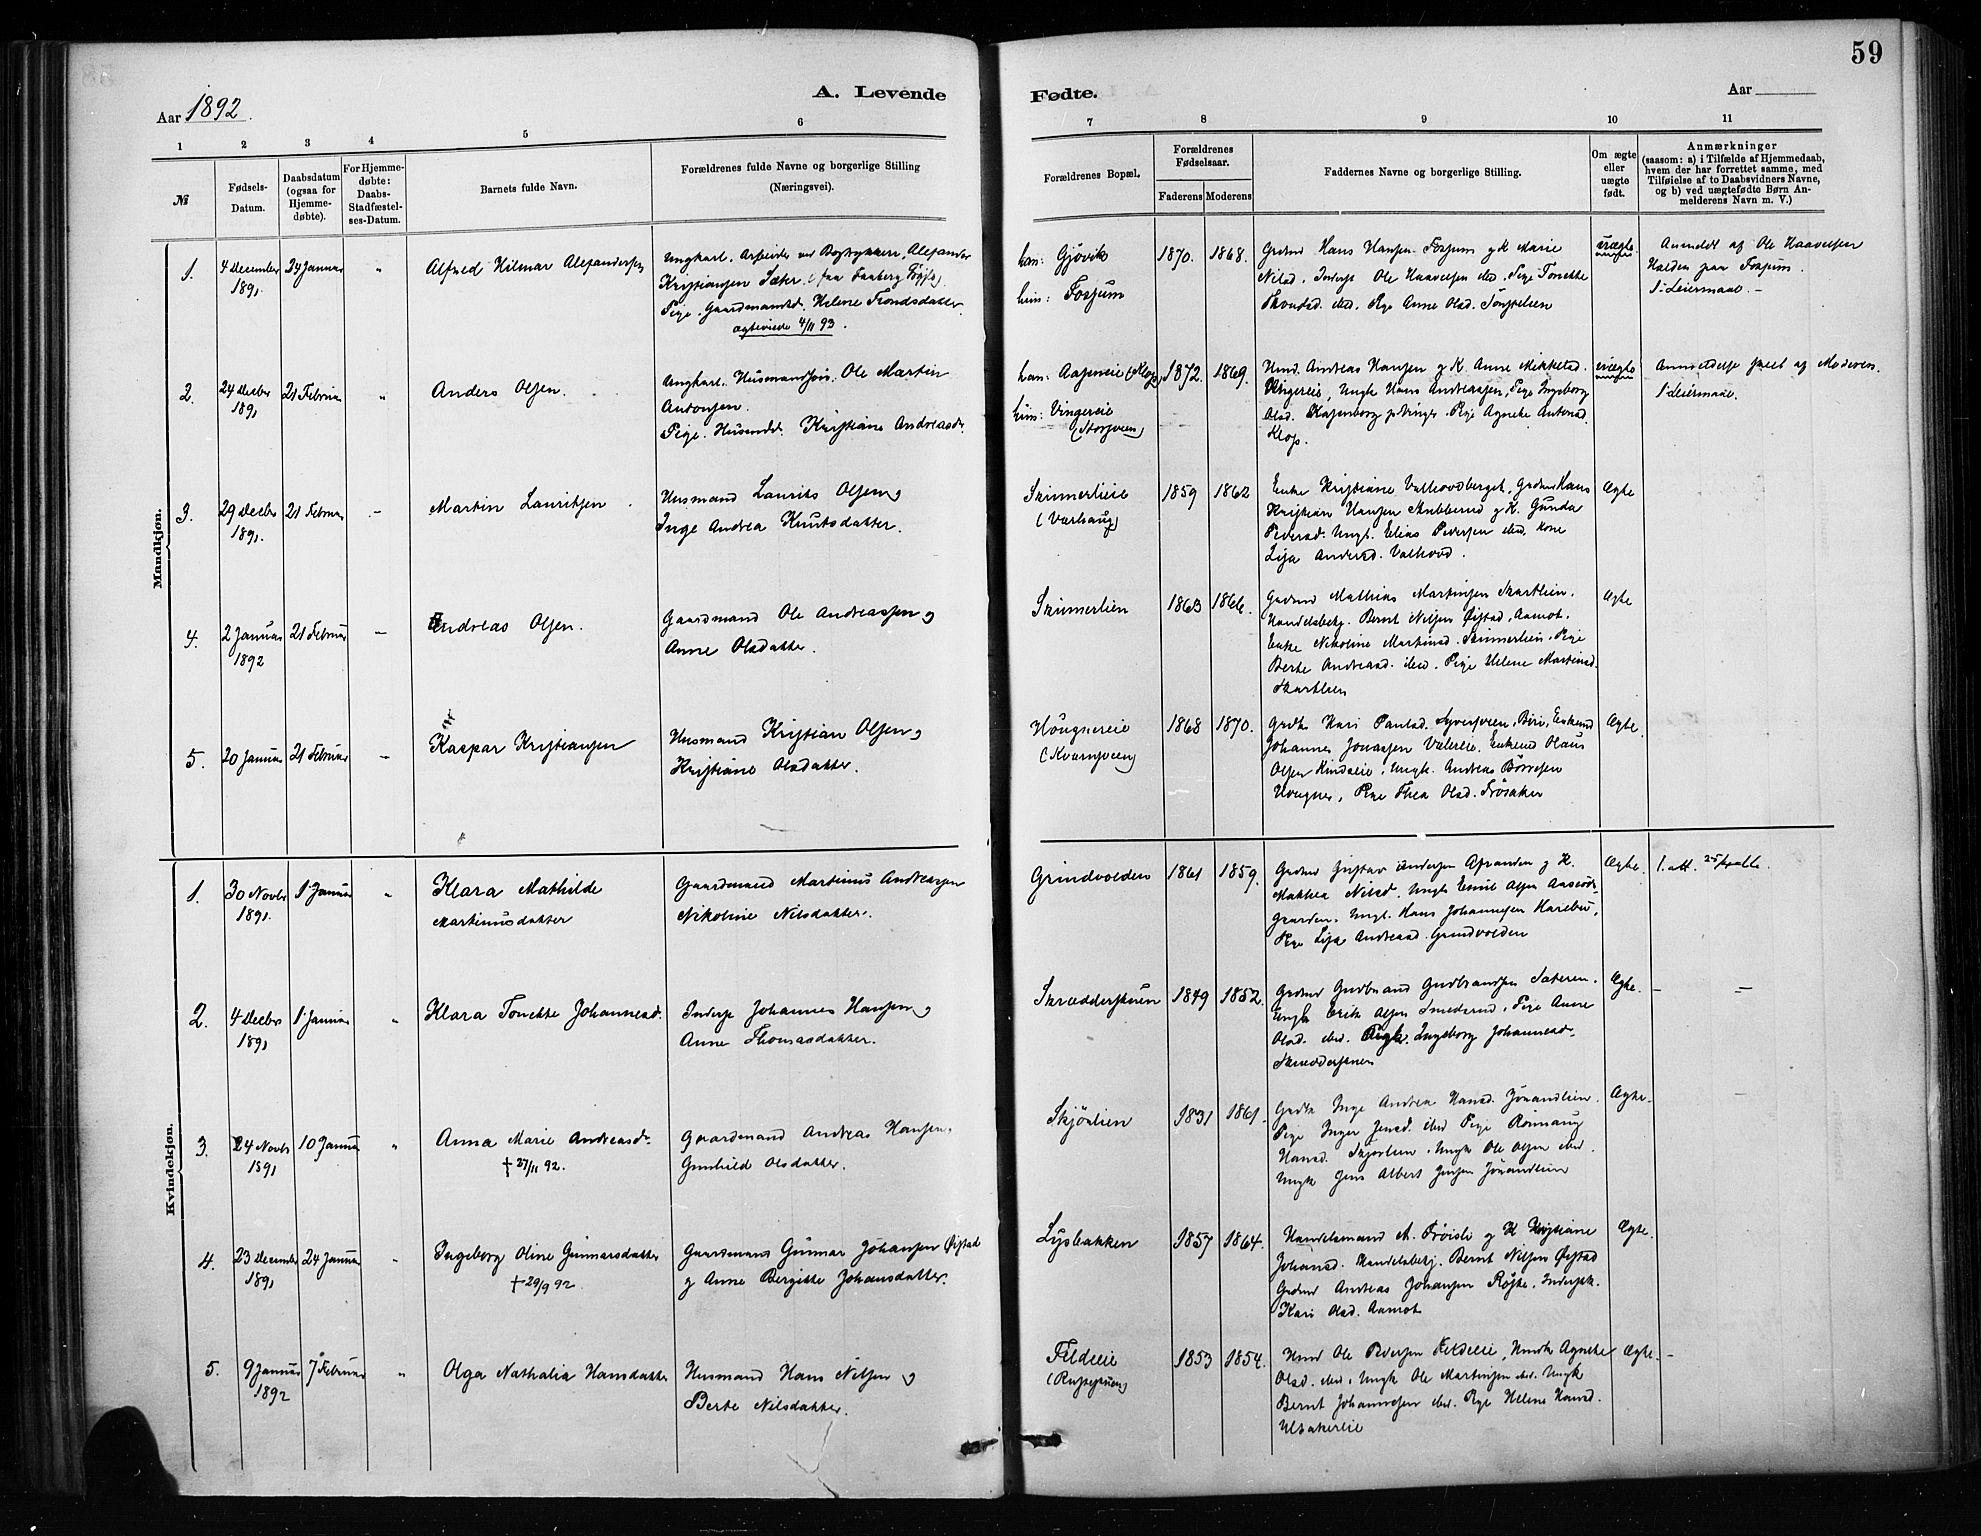 SAH, Nordre Land prestekontor, Ministerialbok nr. 4, 1882-1896, s. 59